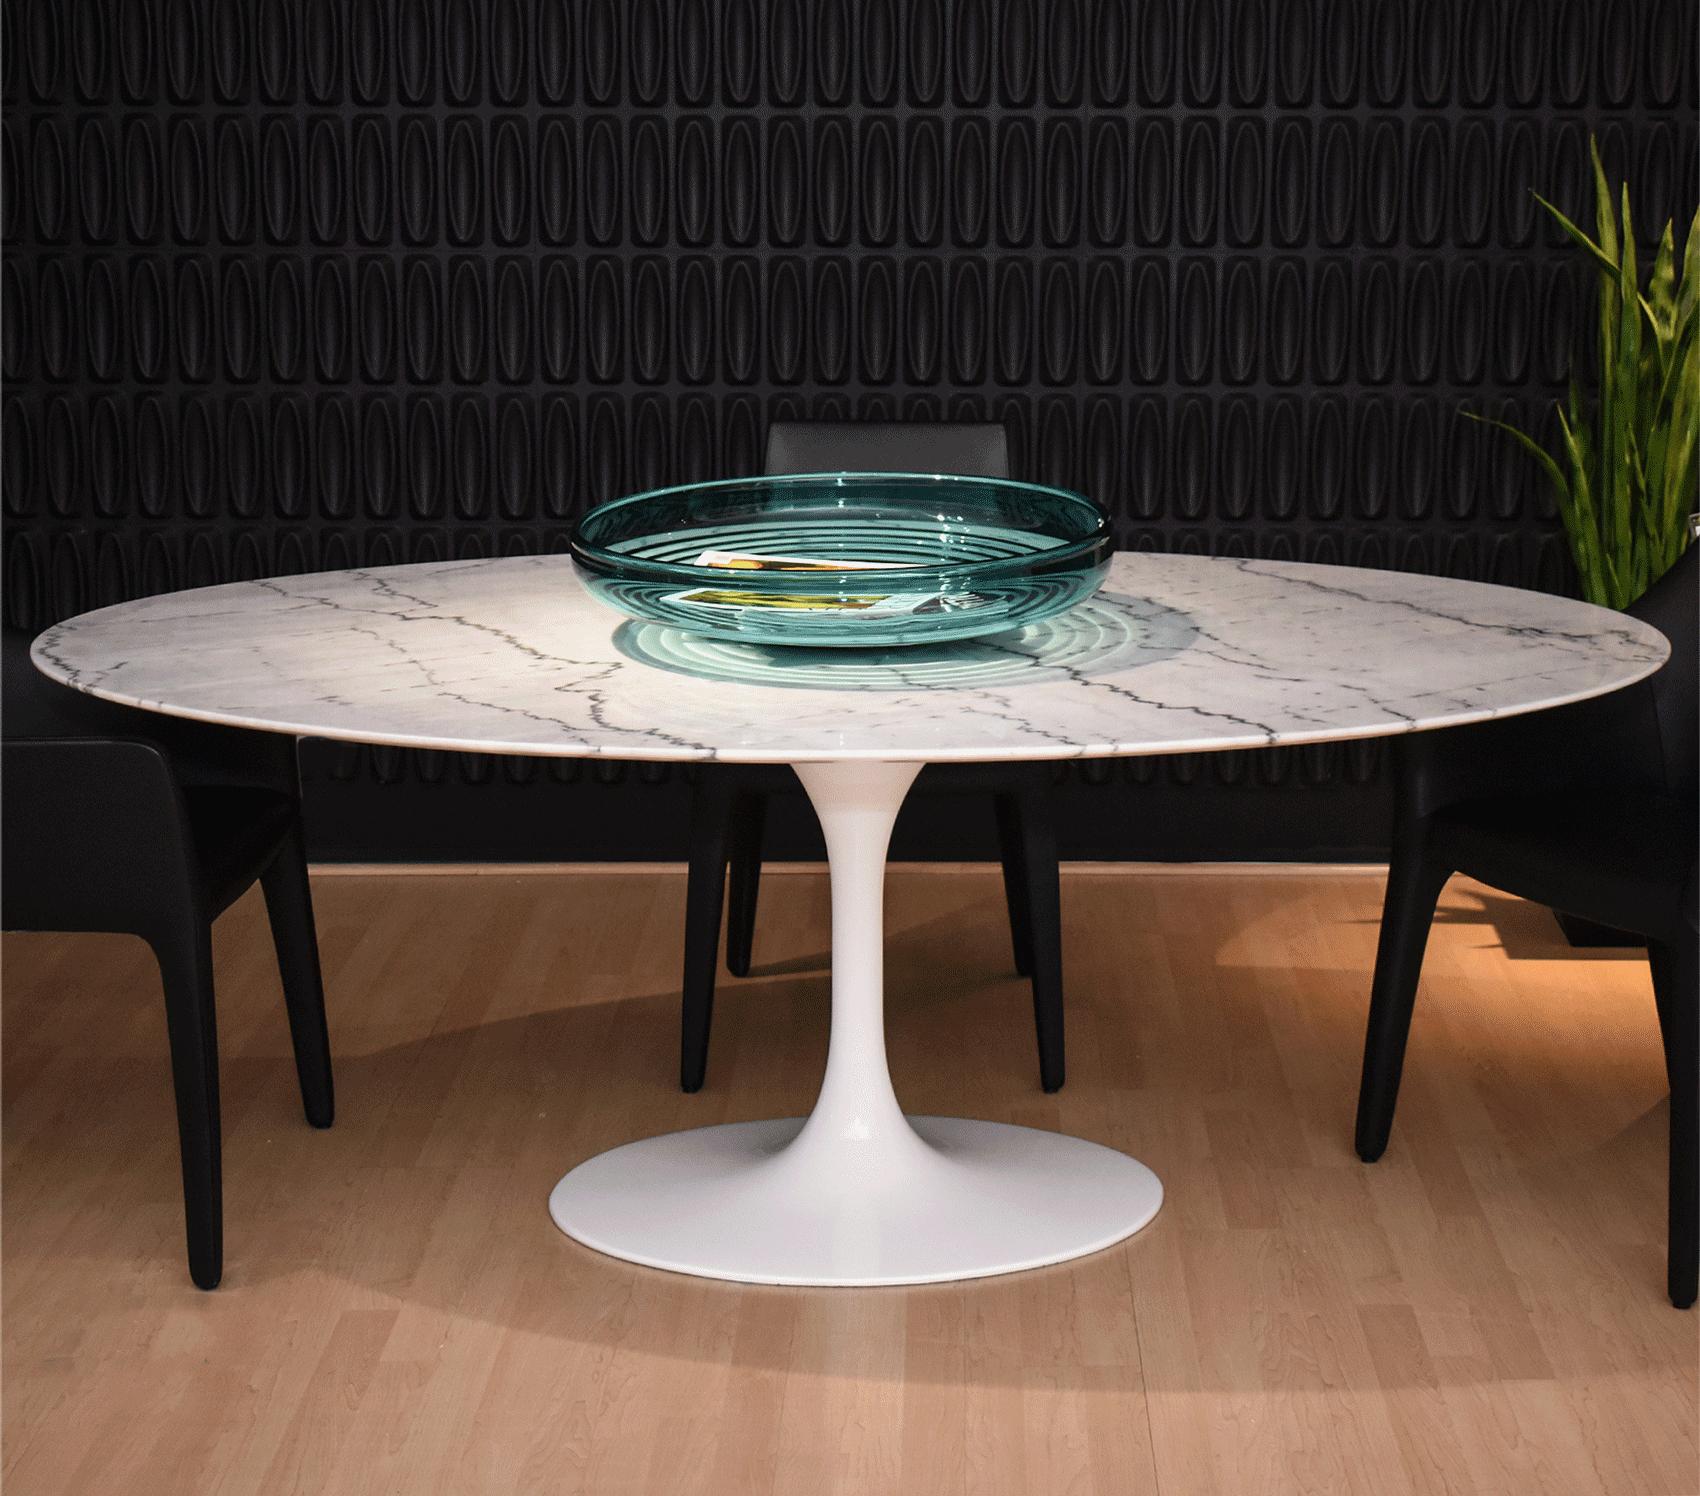 Tulip Oval Table Base Dining Base Tulip TcK1lJuF3